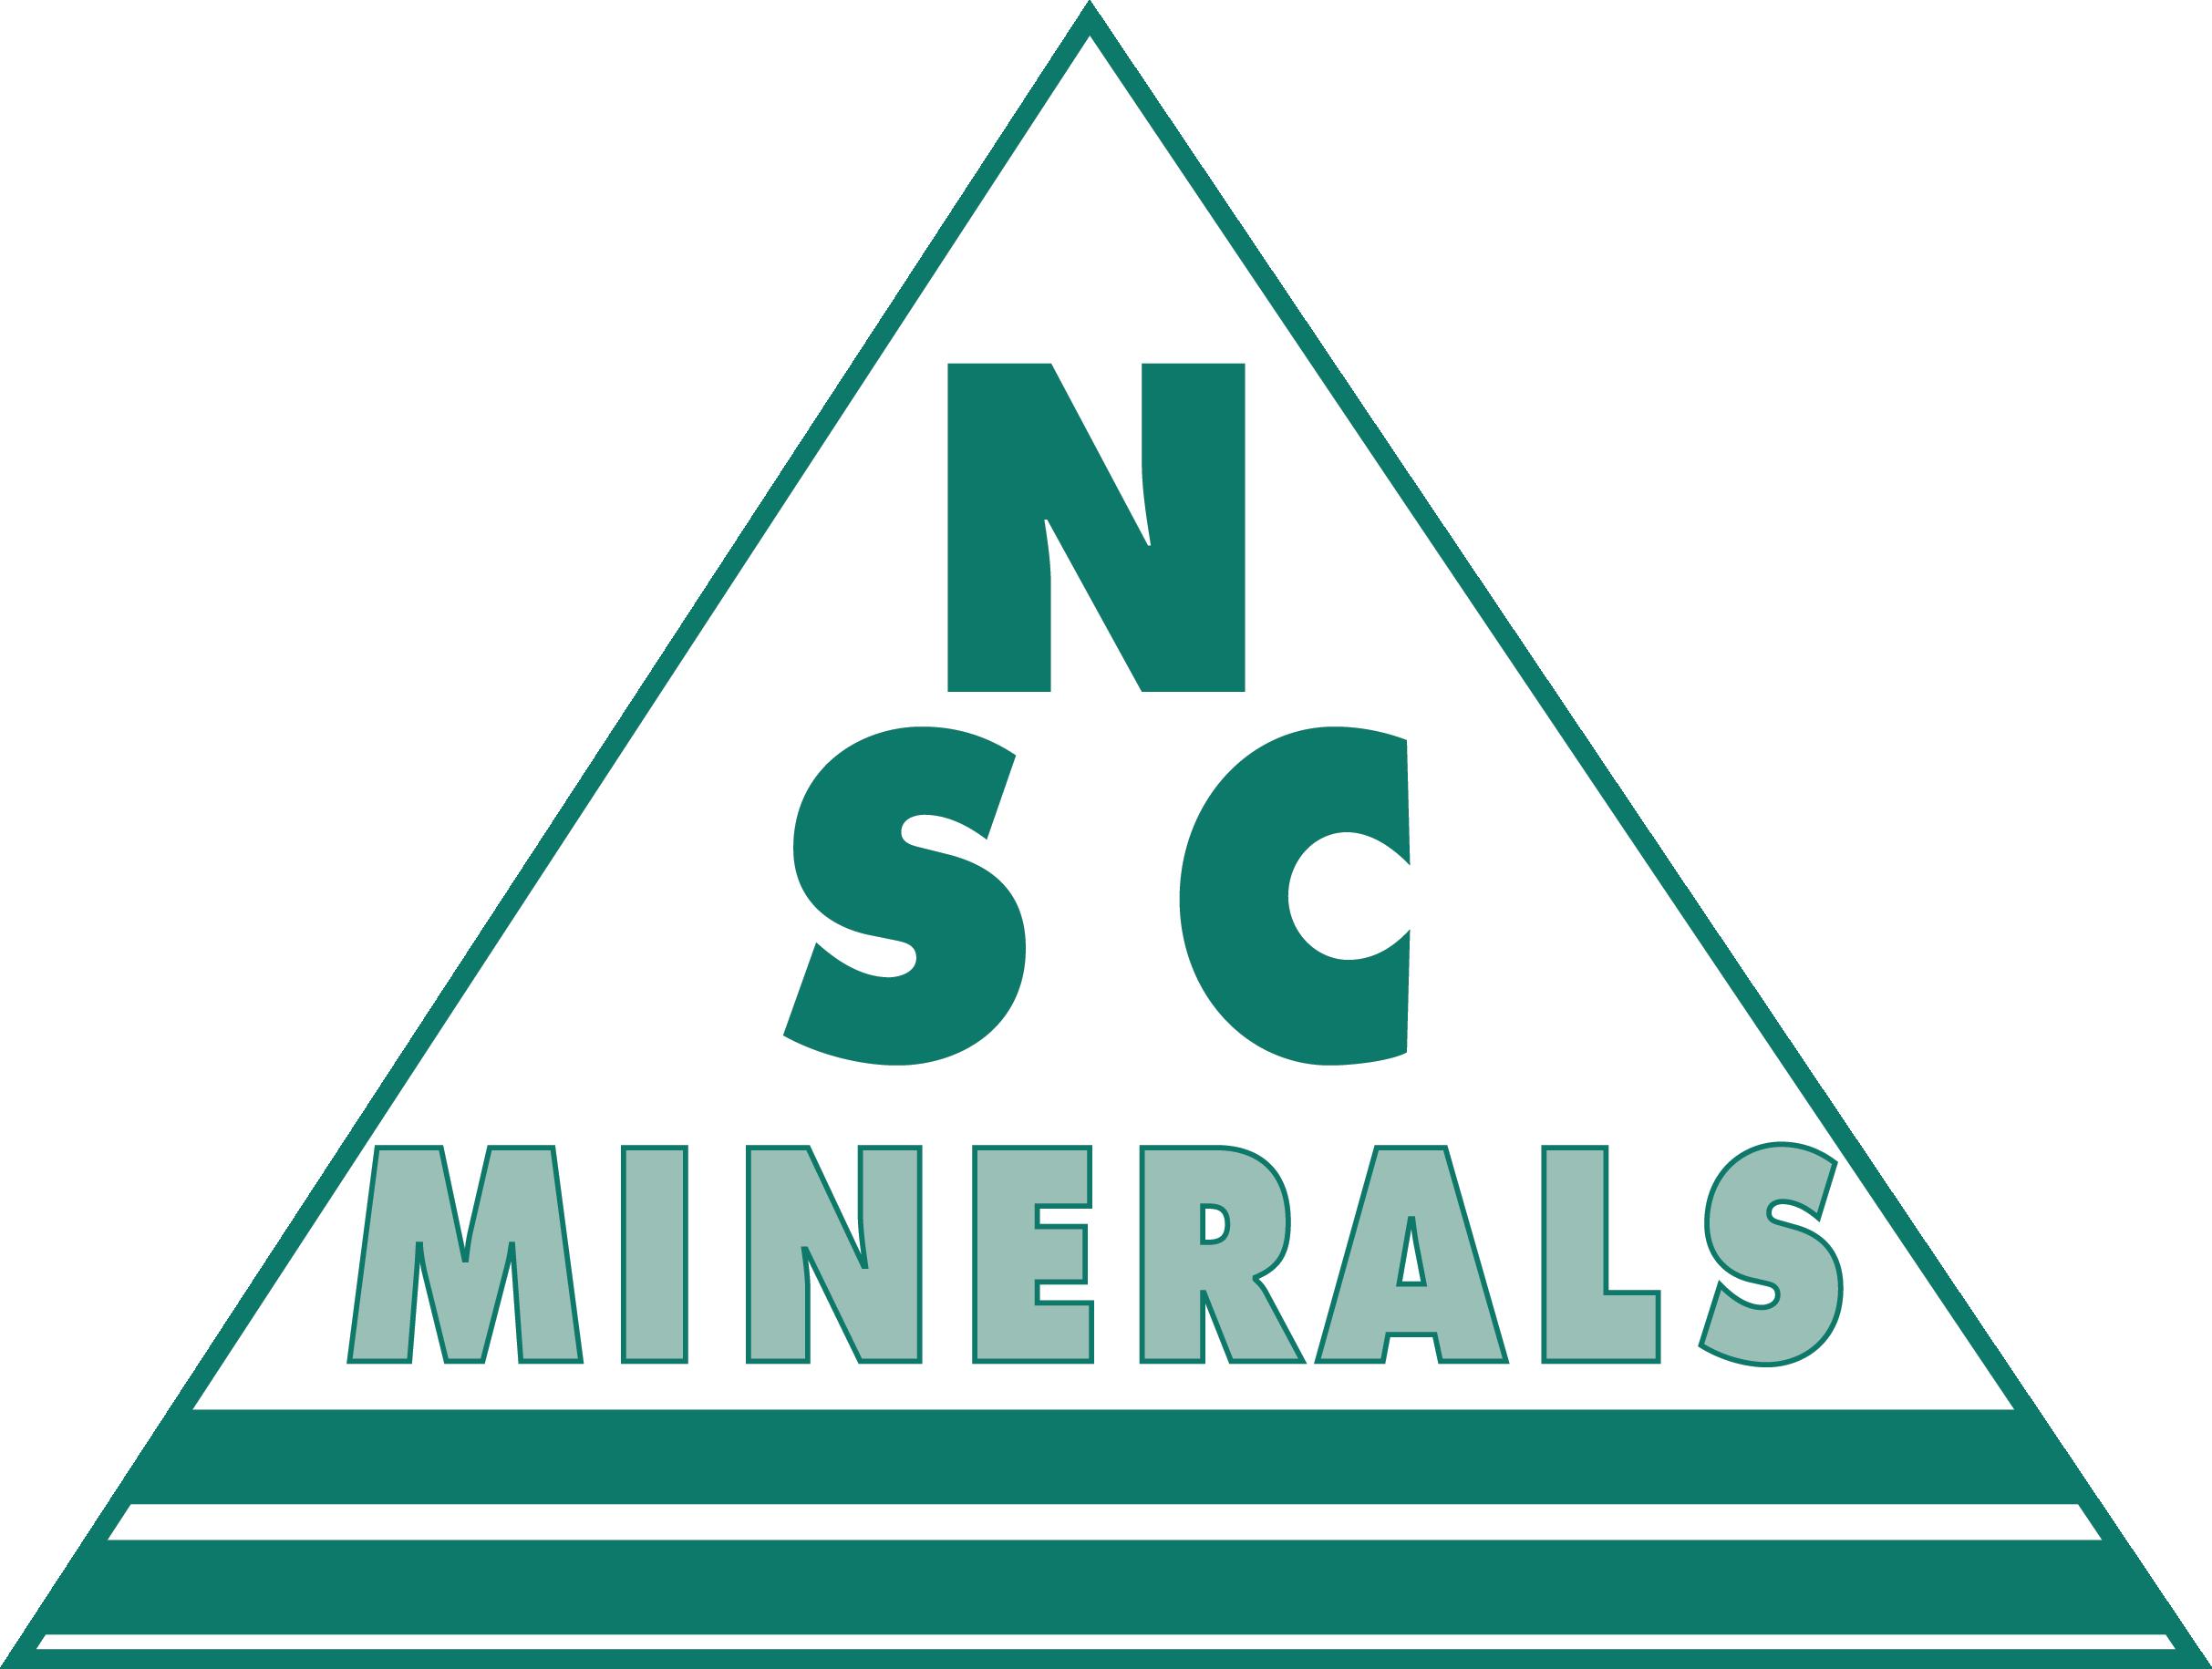 NSC Minerals